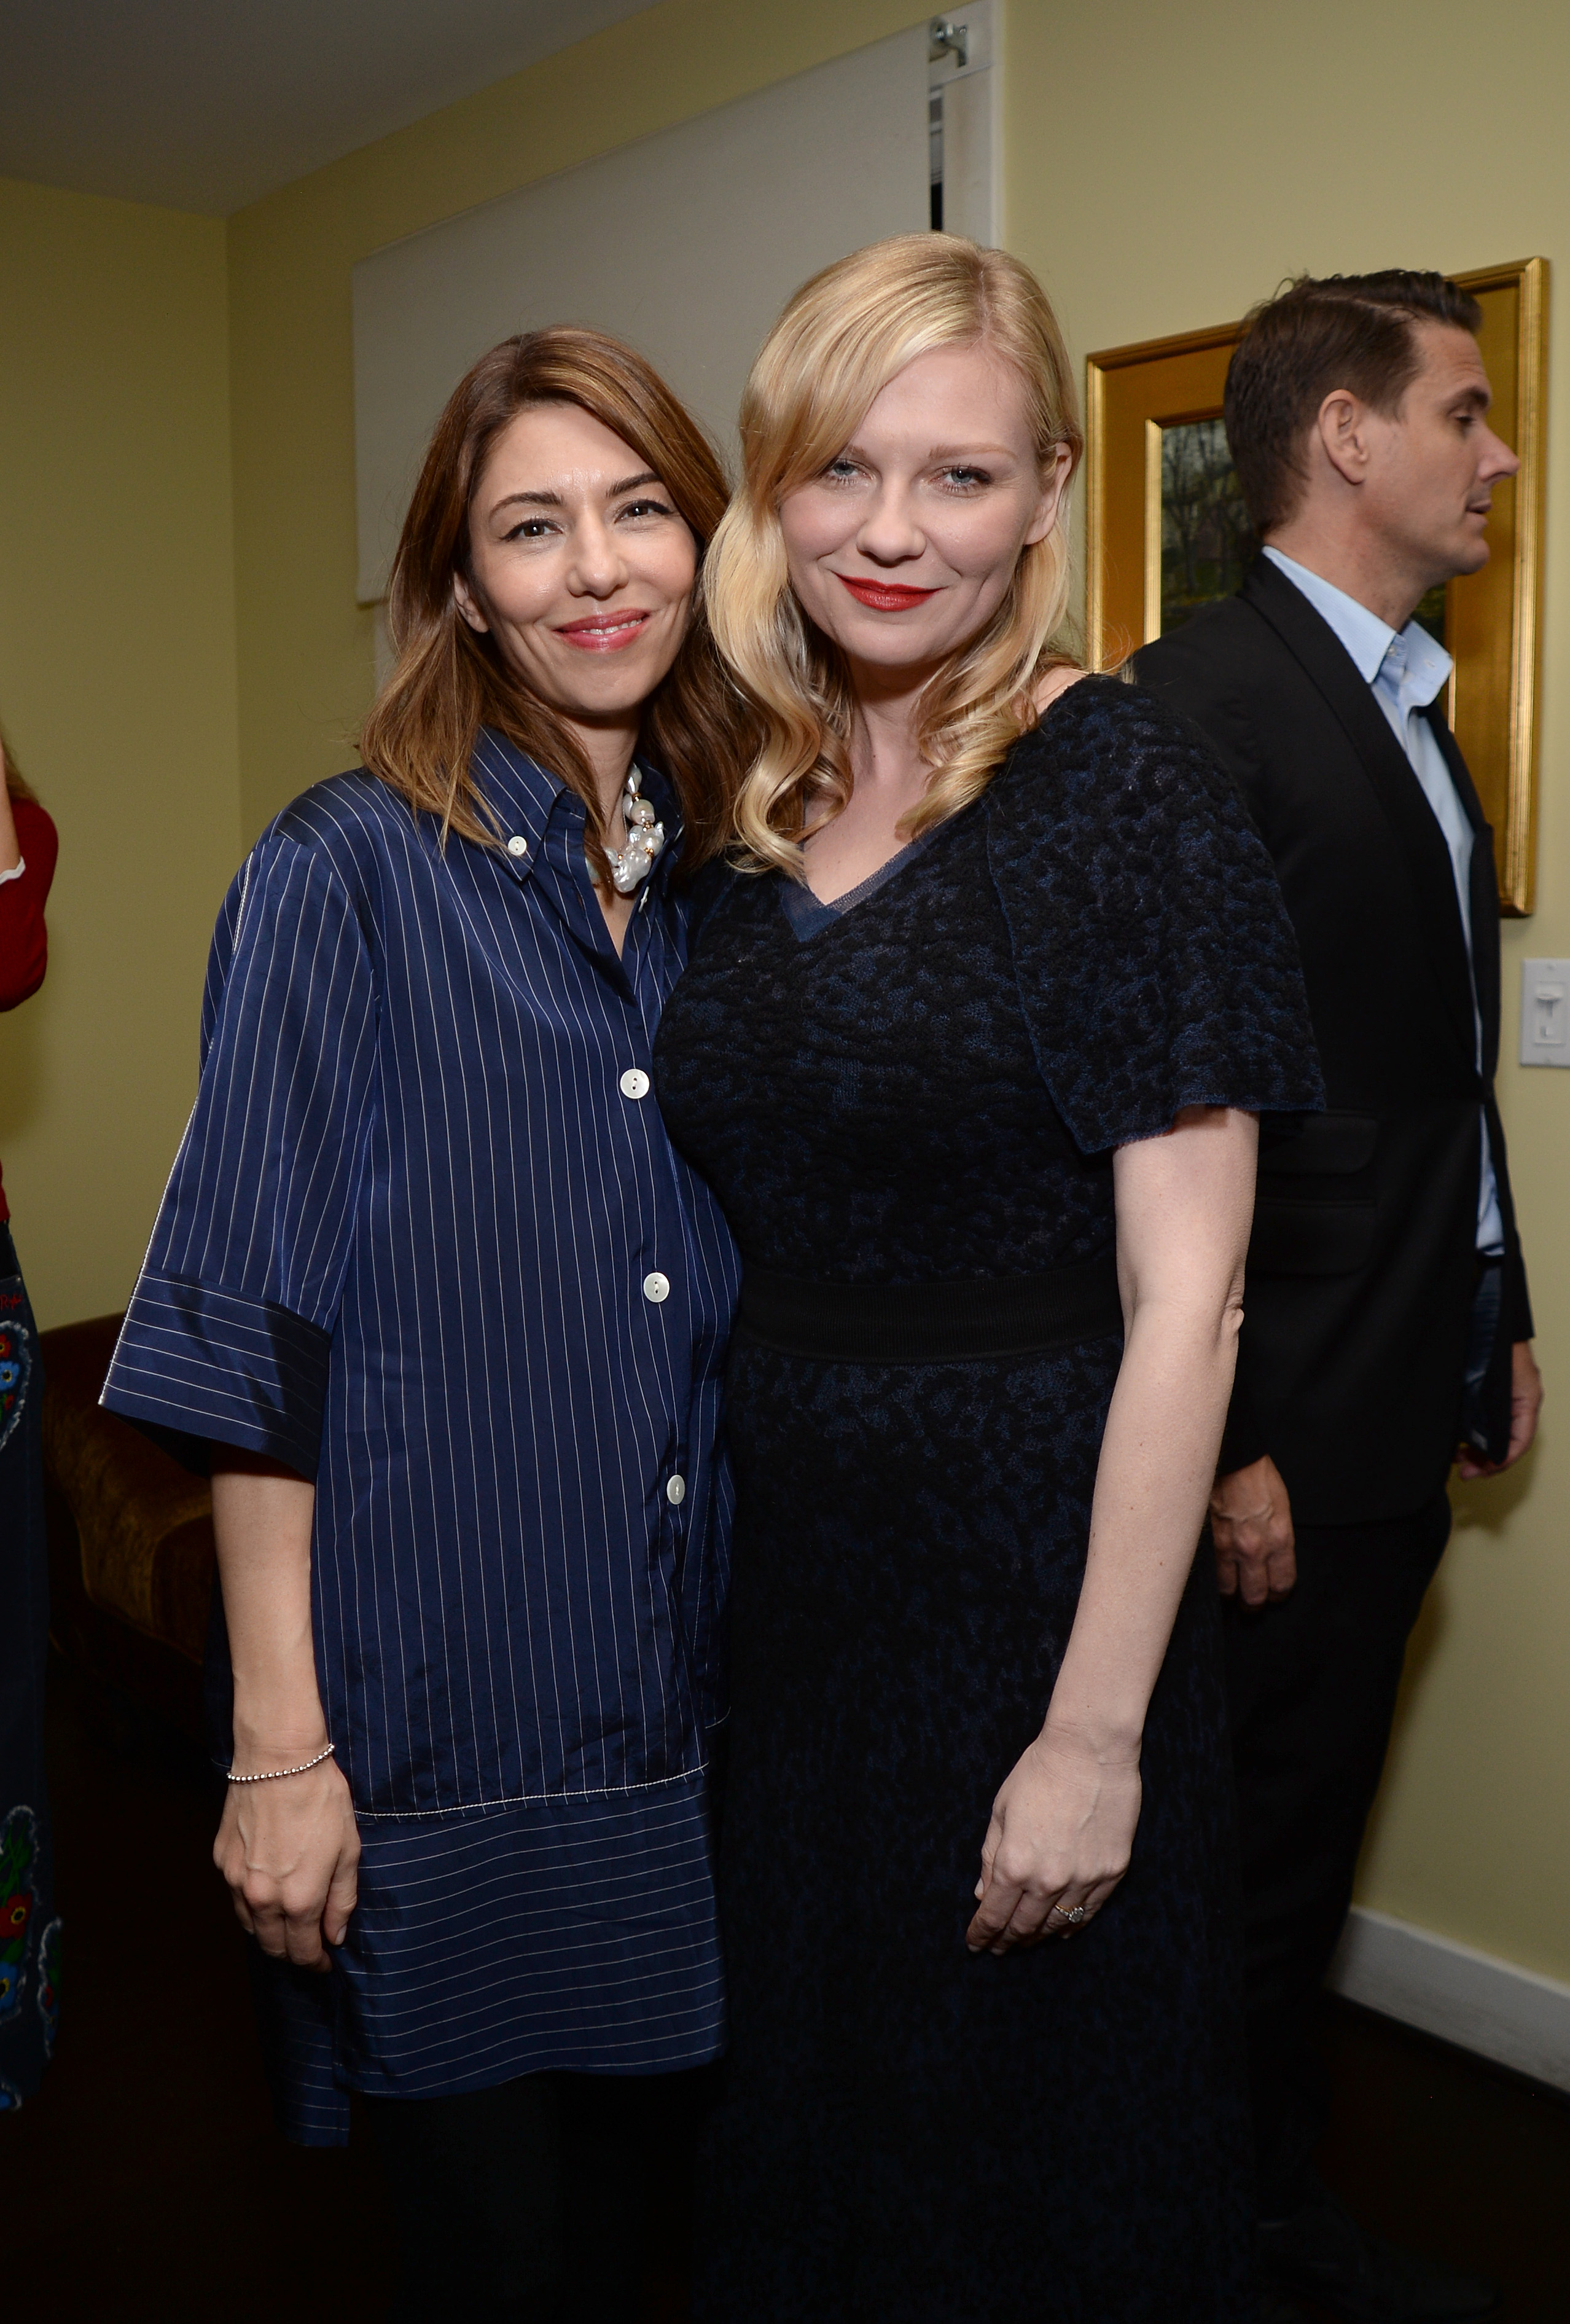 Sofia Coppola and Kirsten DunstSonia Rykiel event, Los Angeles, USA - 09 Nov 2017